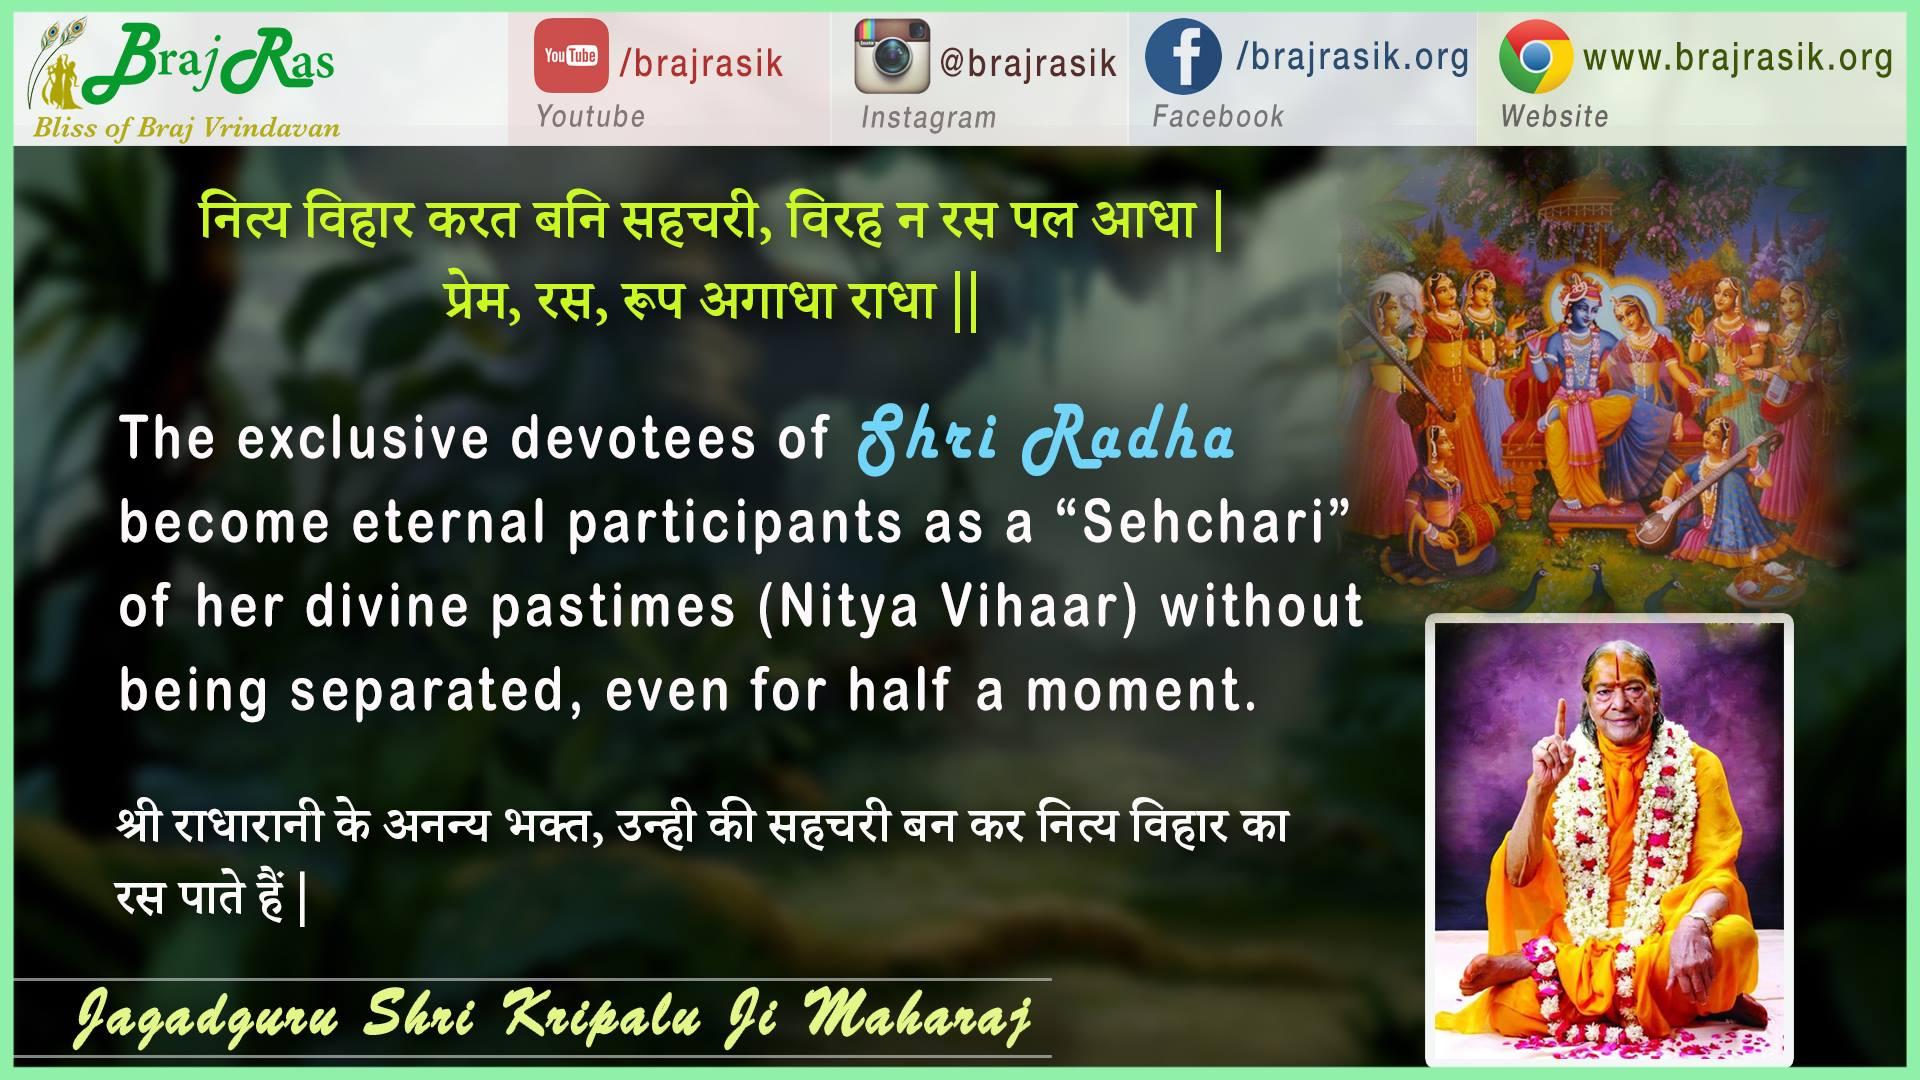 Nitya Vihaar Karat Bani Sehchari- Jagadguru Shri Kripalu Ji Maharaj